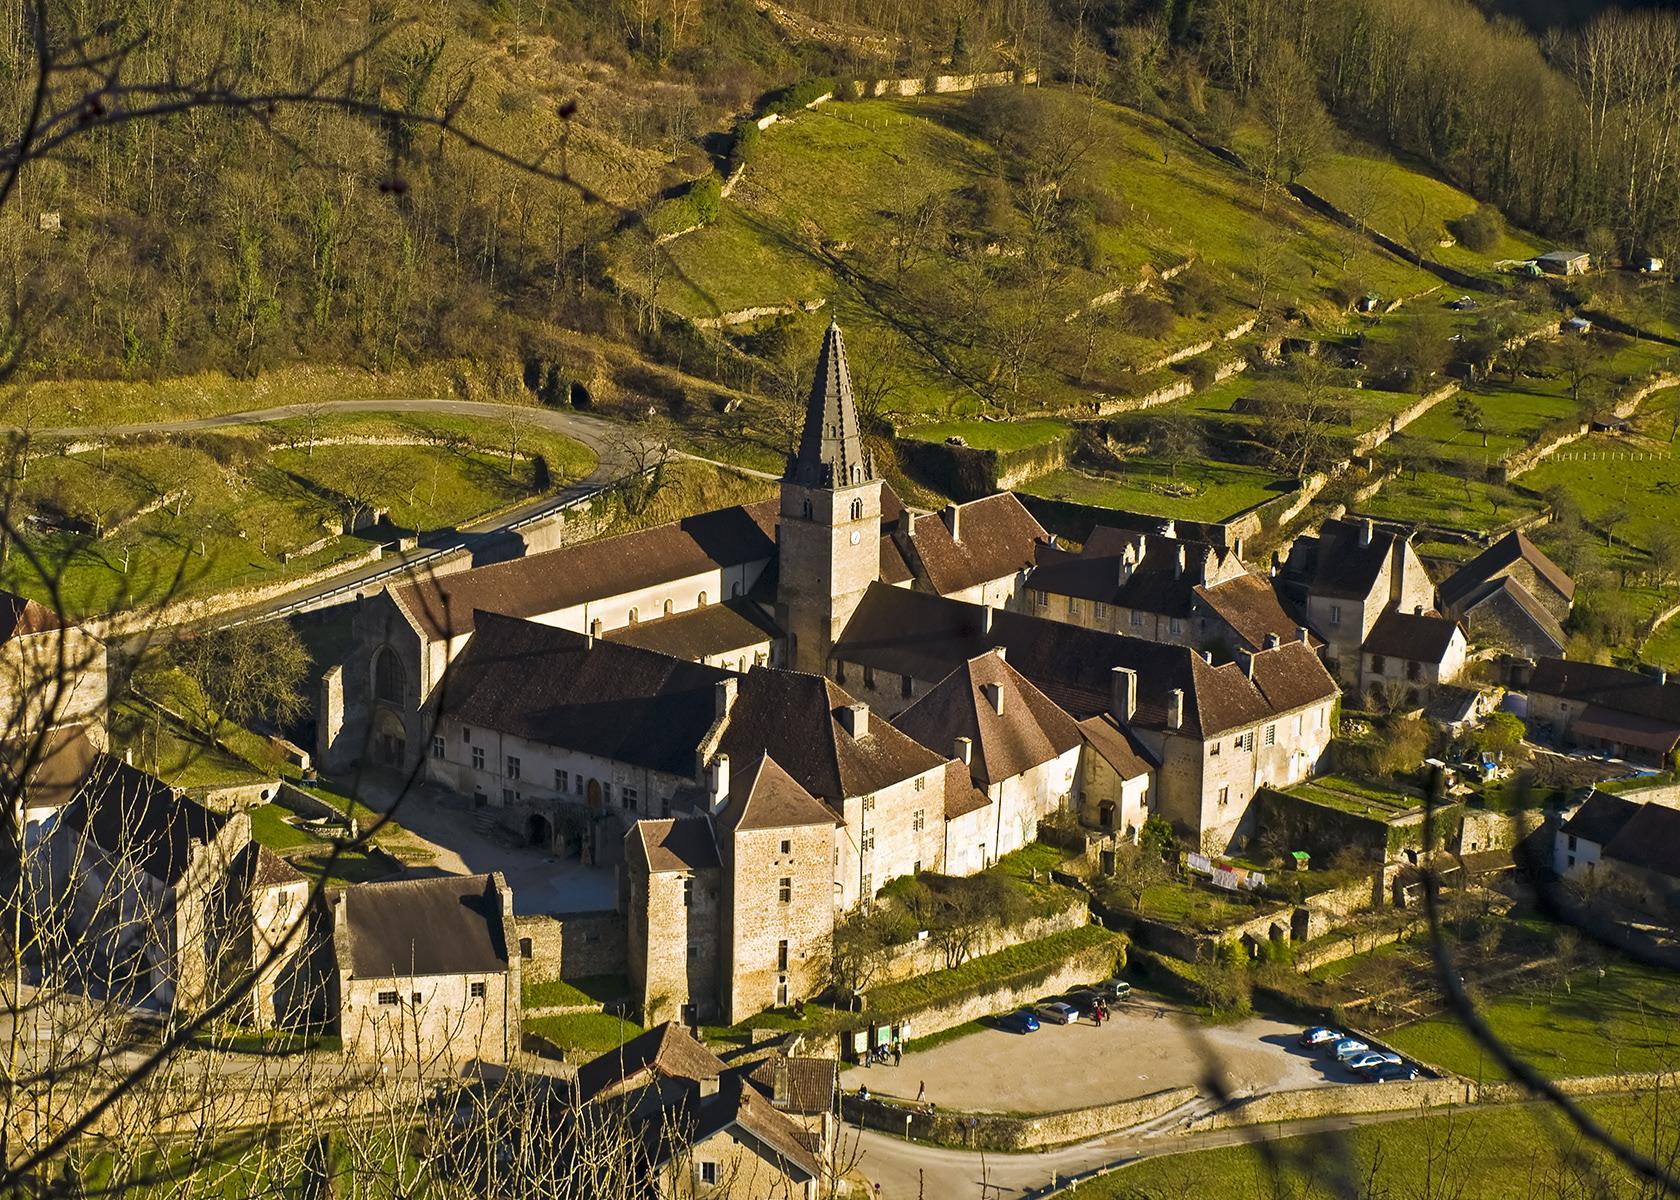 247-l'abbaye_de_baume-les-messieurs.jpg